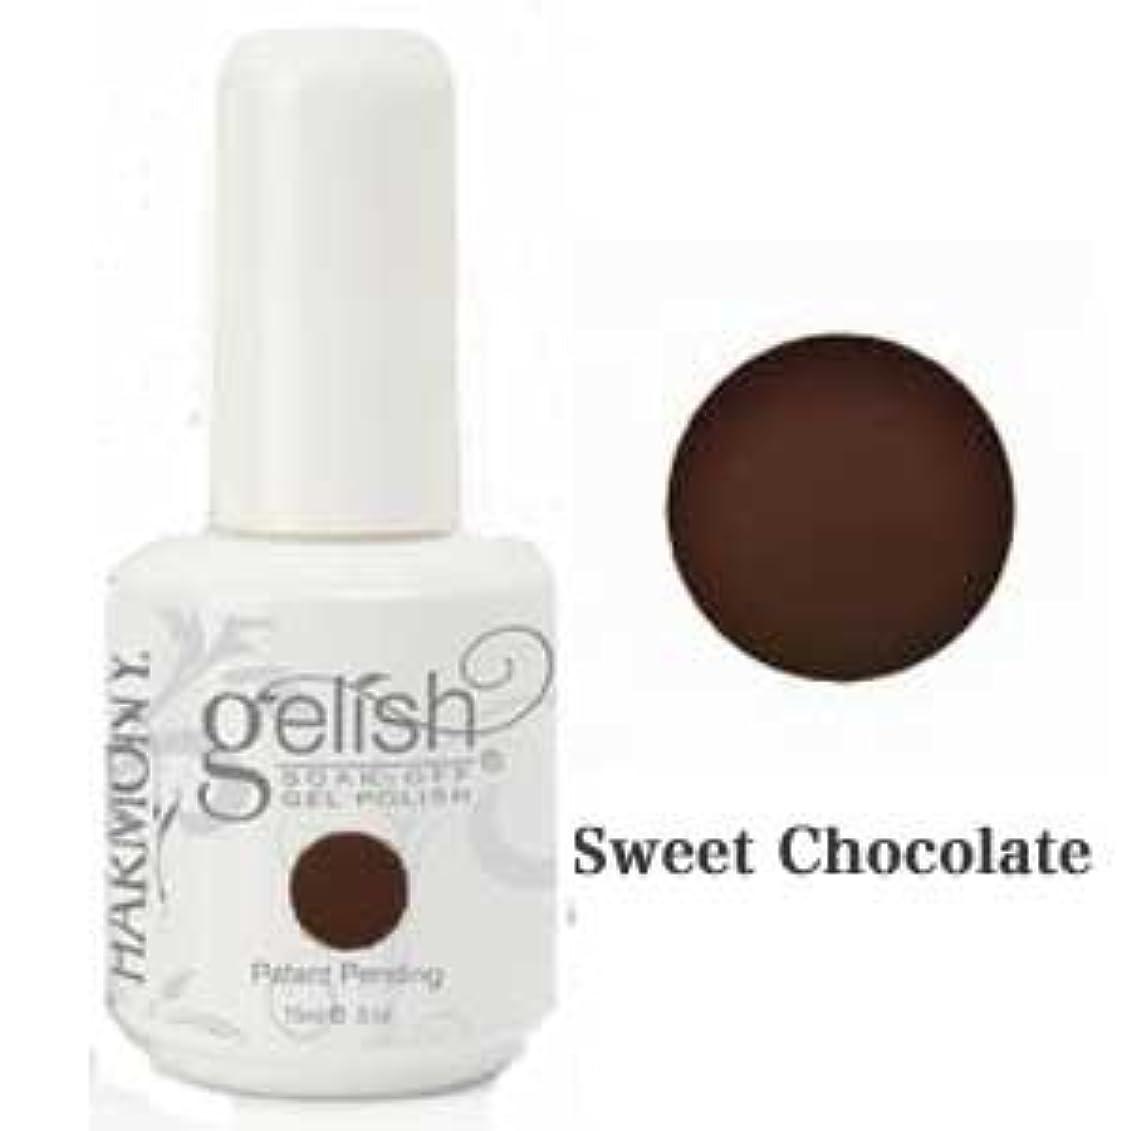 Harmony gelishソークオフジェル-Sweet Chocolate 15ml [海外直送品][並行輸入品]